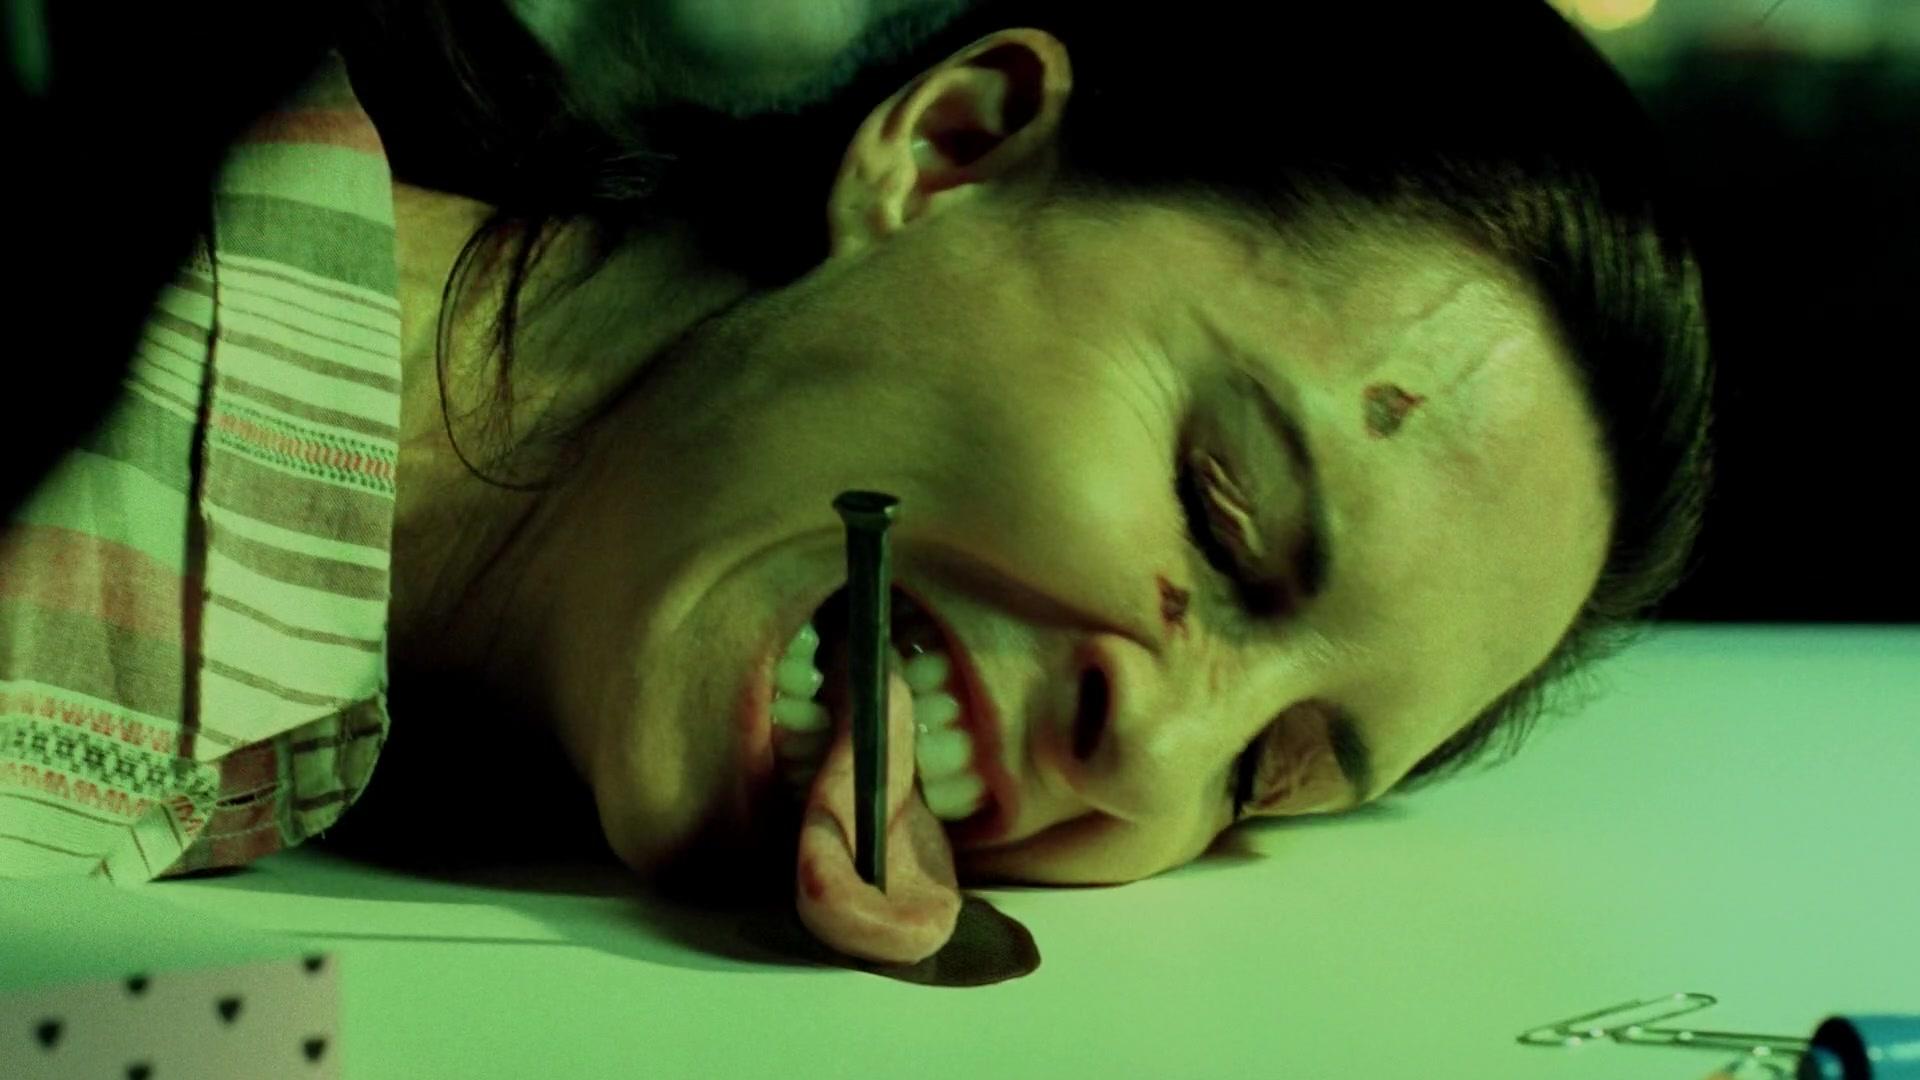 American_Horror_Story_Hotel_S05E07_1080p__1957